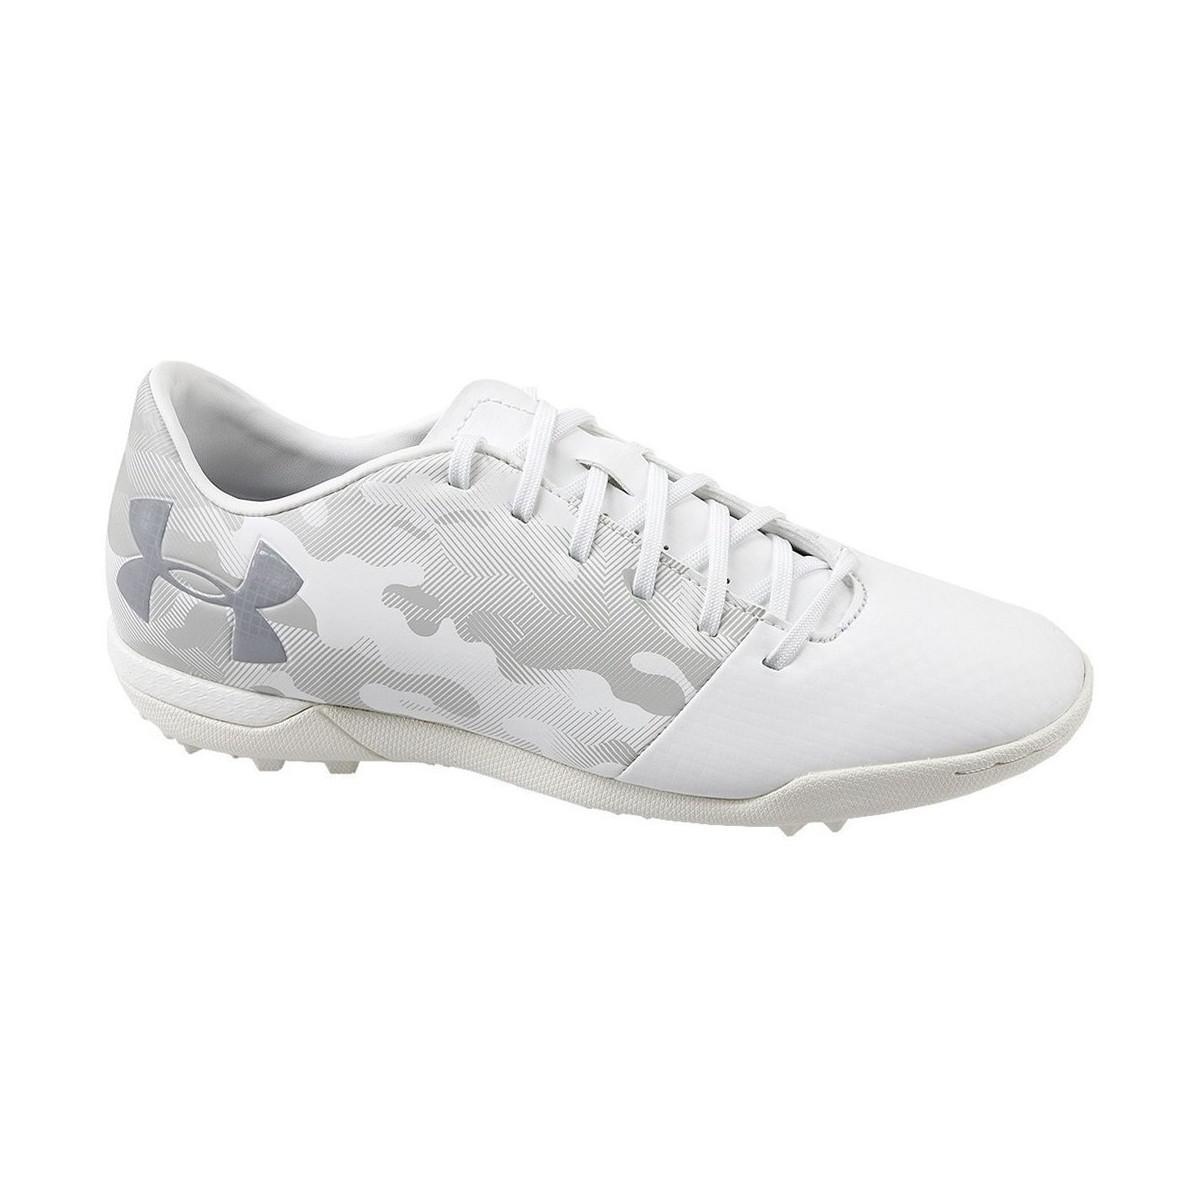 193de11bb Under Armour Ua Spotlight Tf Men's Football Boots In Grey in Gray ...